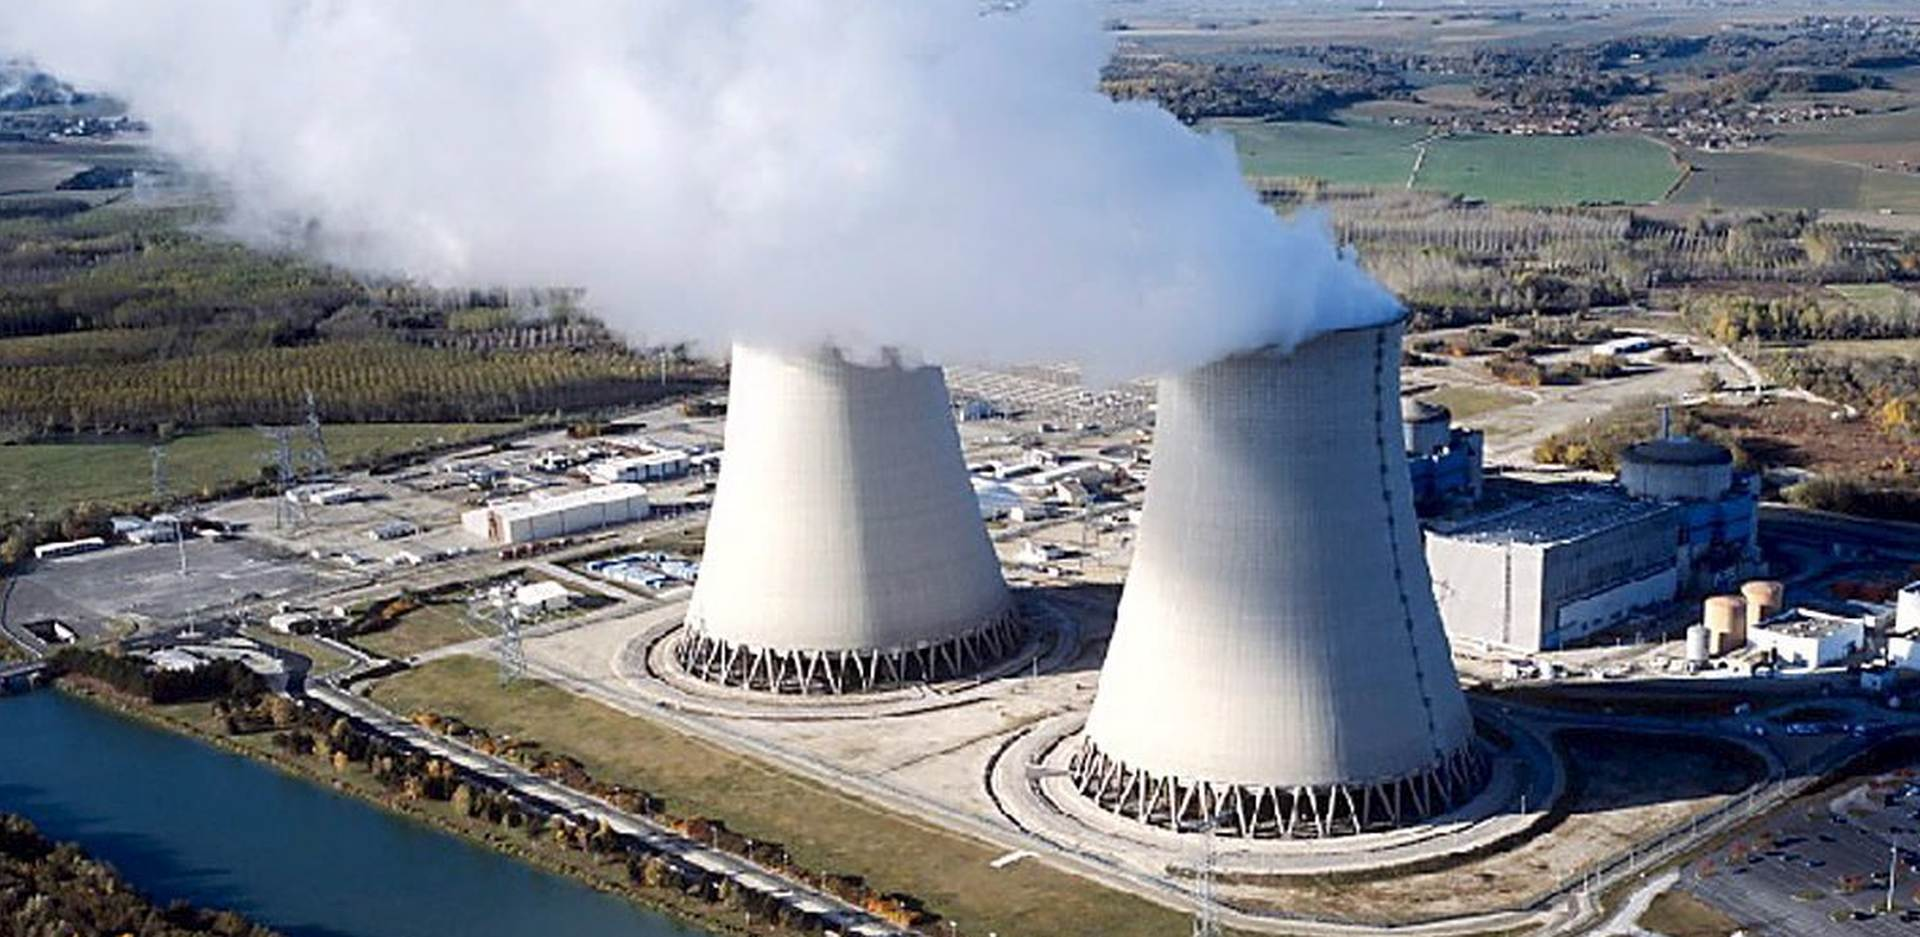 PRIJETI LANSIRANJEM RAKETE: Pyongyang pokrenuo nuklearni reaktor u Yongbyonu